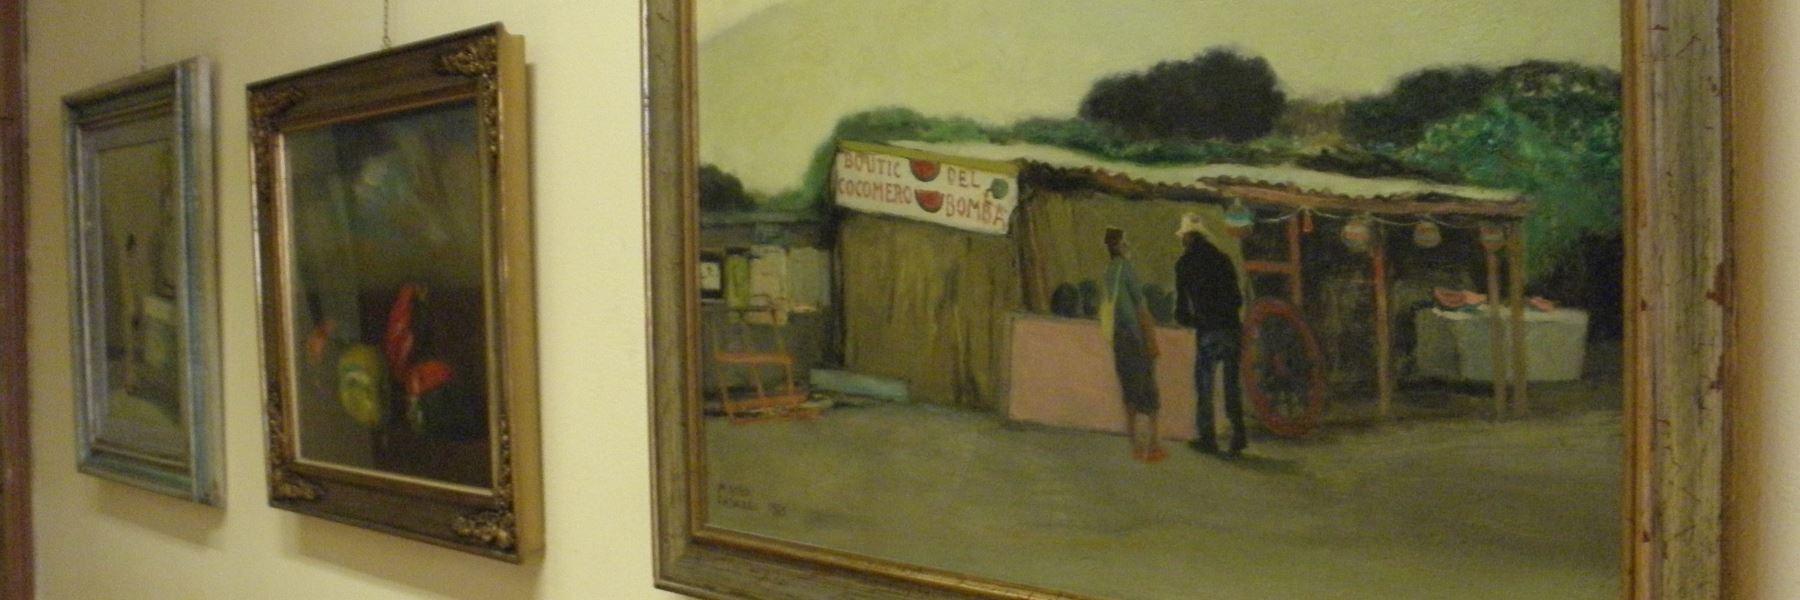 Exposition permanent de Maceo Casadei